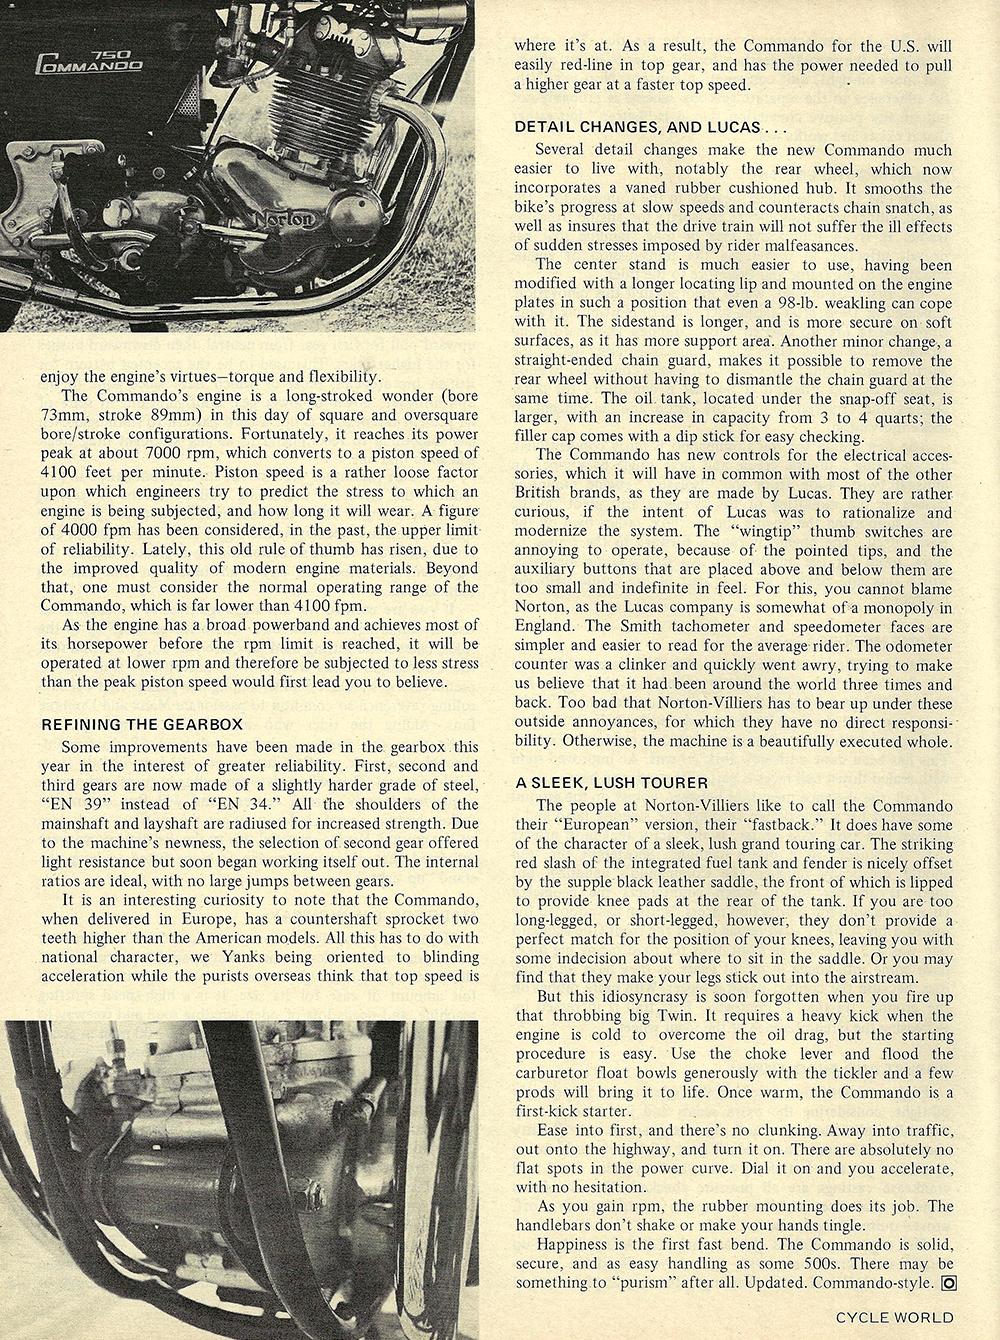 1971 Norton 750 Commando Fastback road test 03.jpg